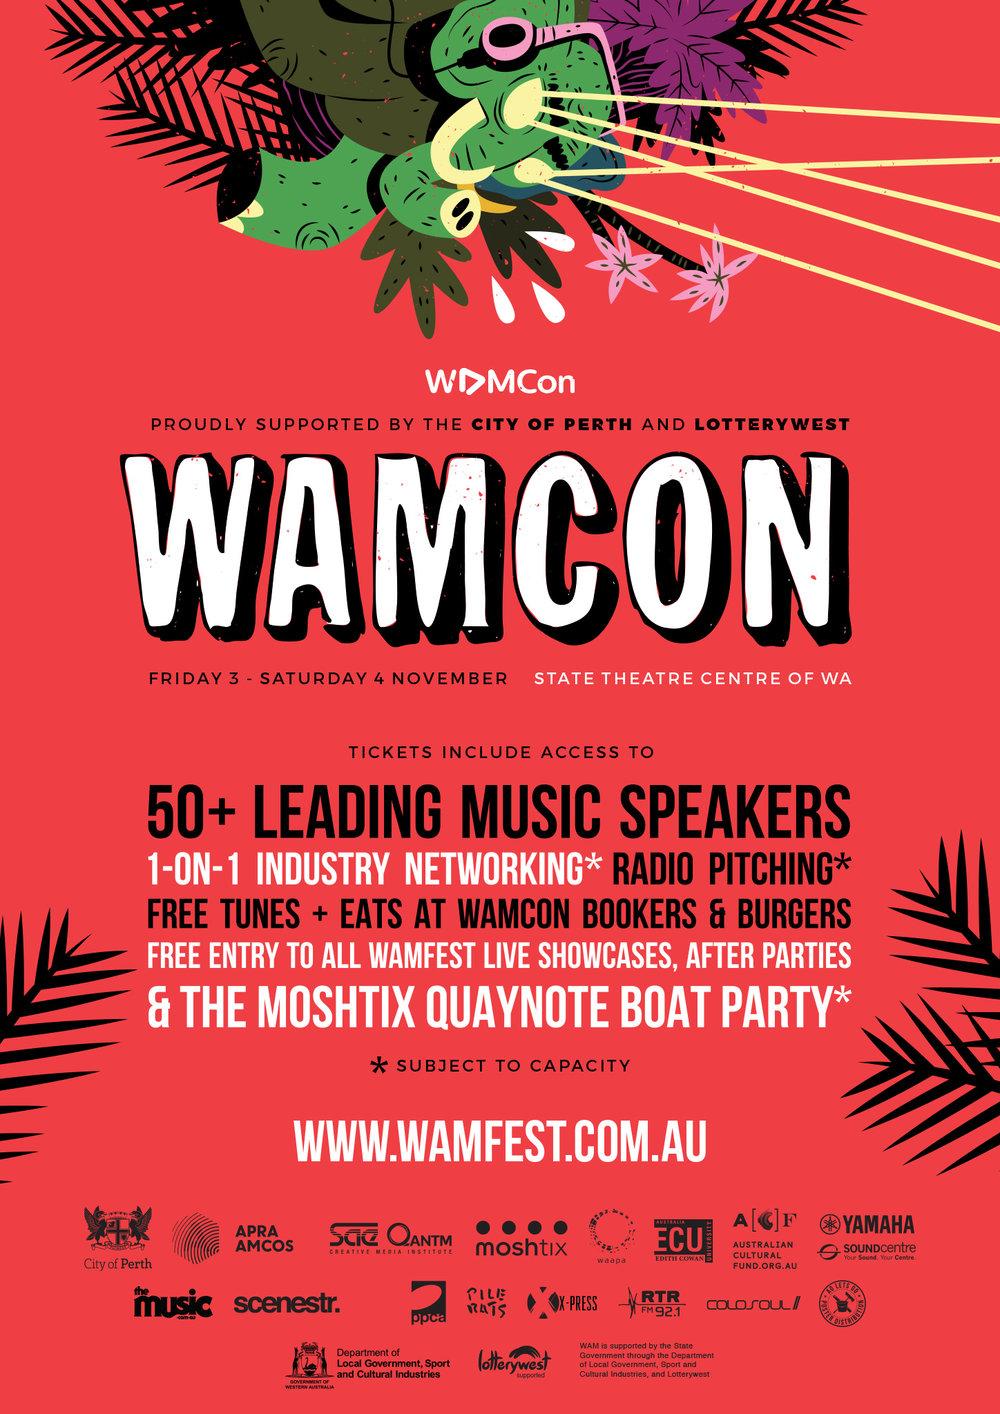 WAM2017-posters-A3-2.jpg